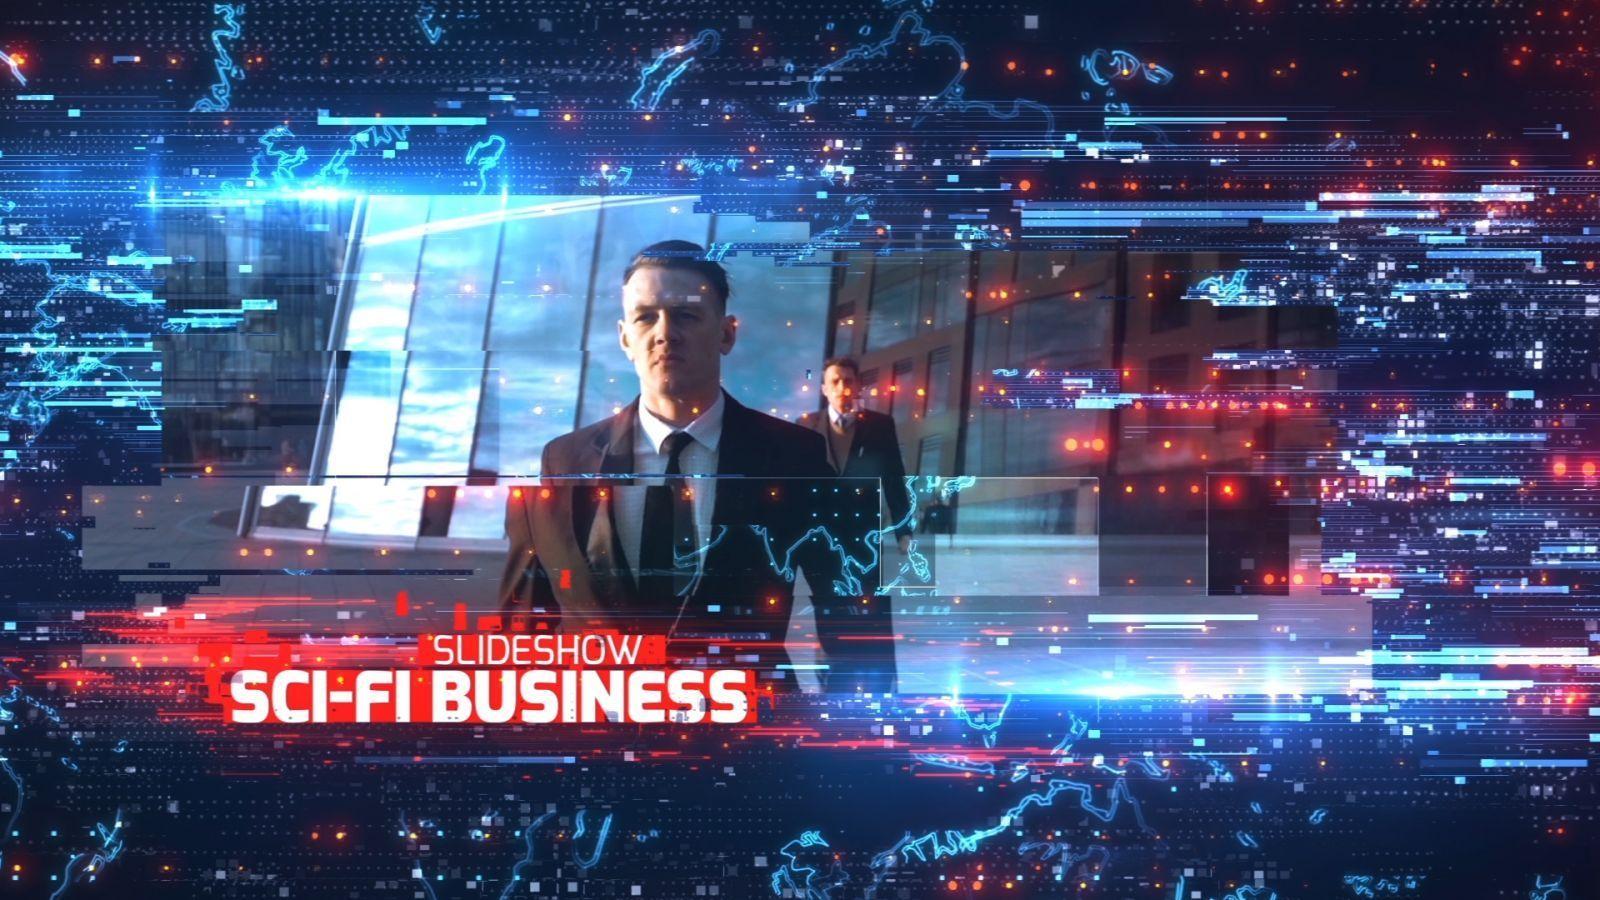 Sci-Fi Business Slideshow